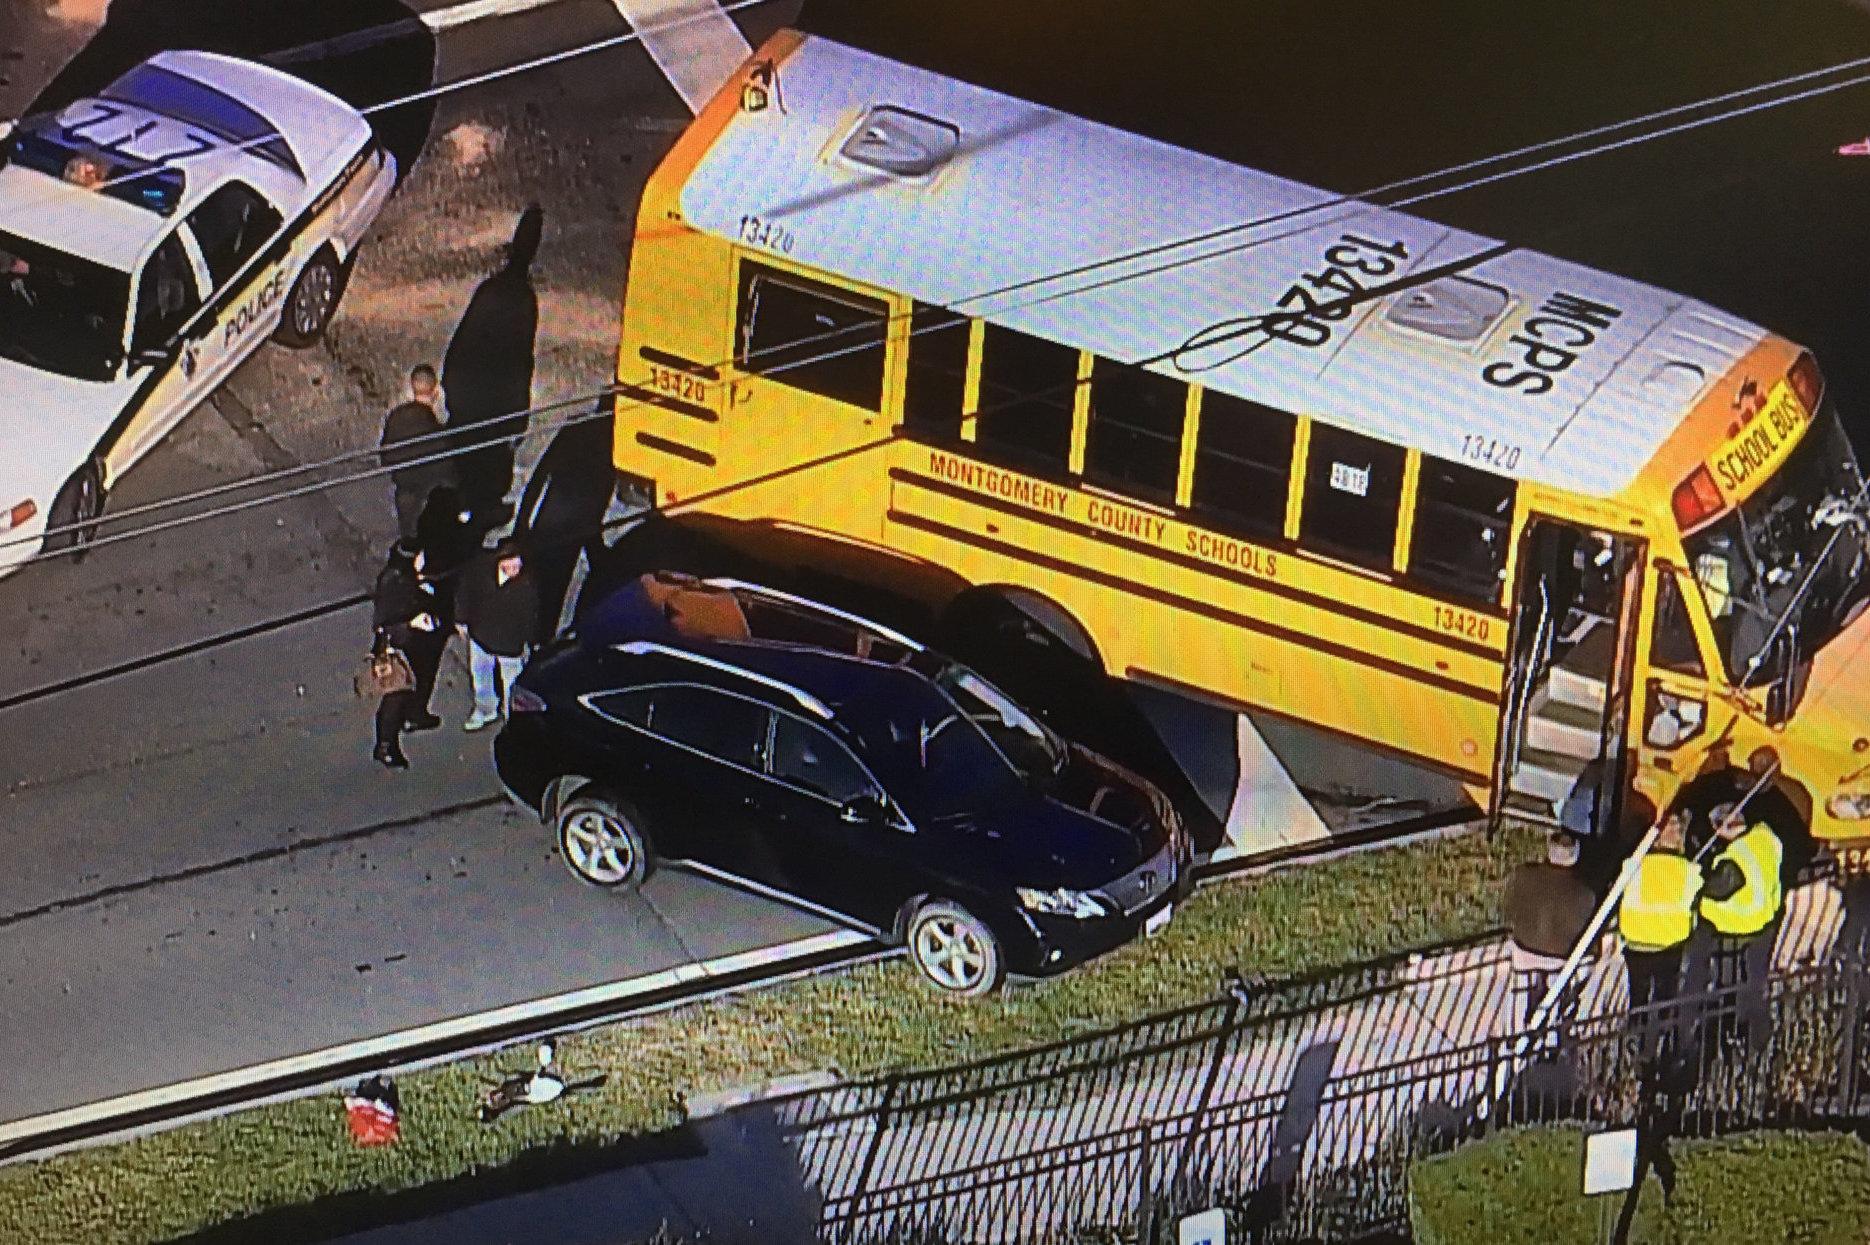 2 children injured in Md  Route 355 school bus crash | WTOP